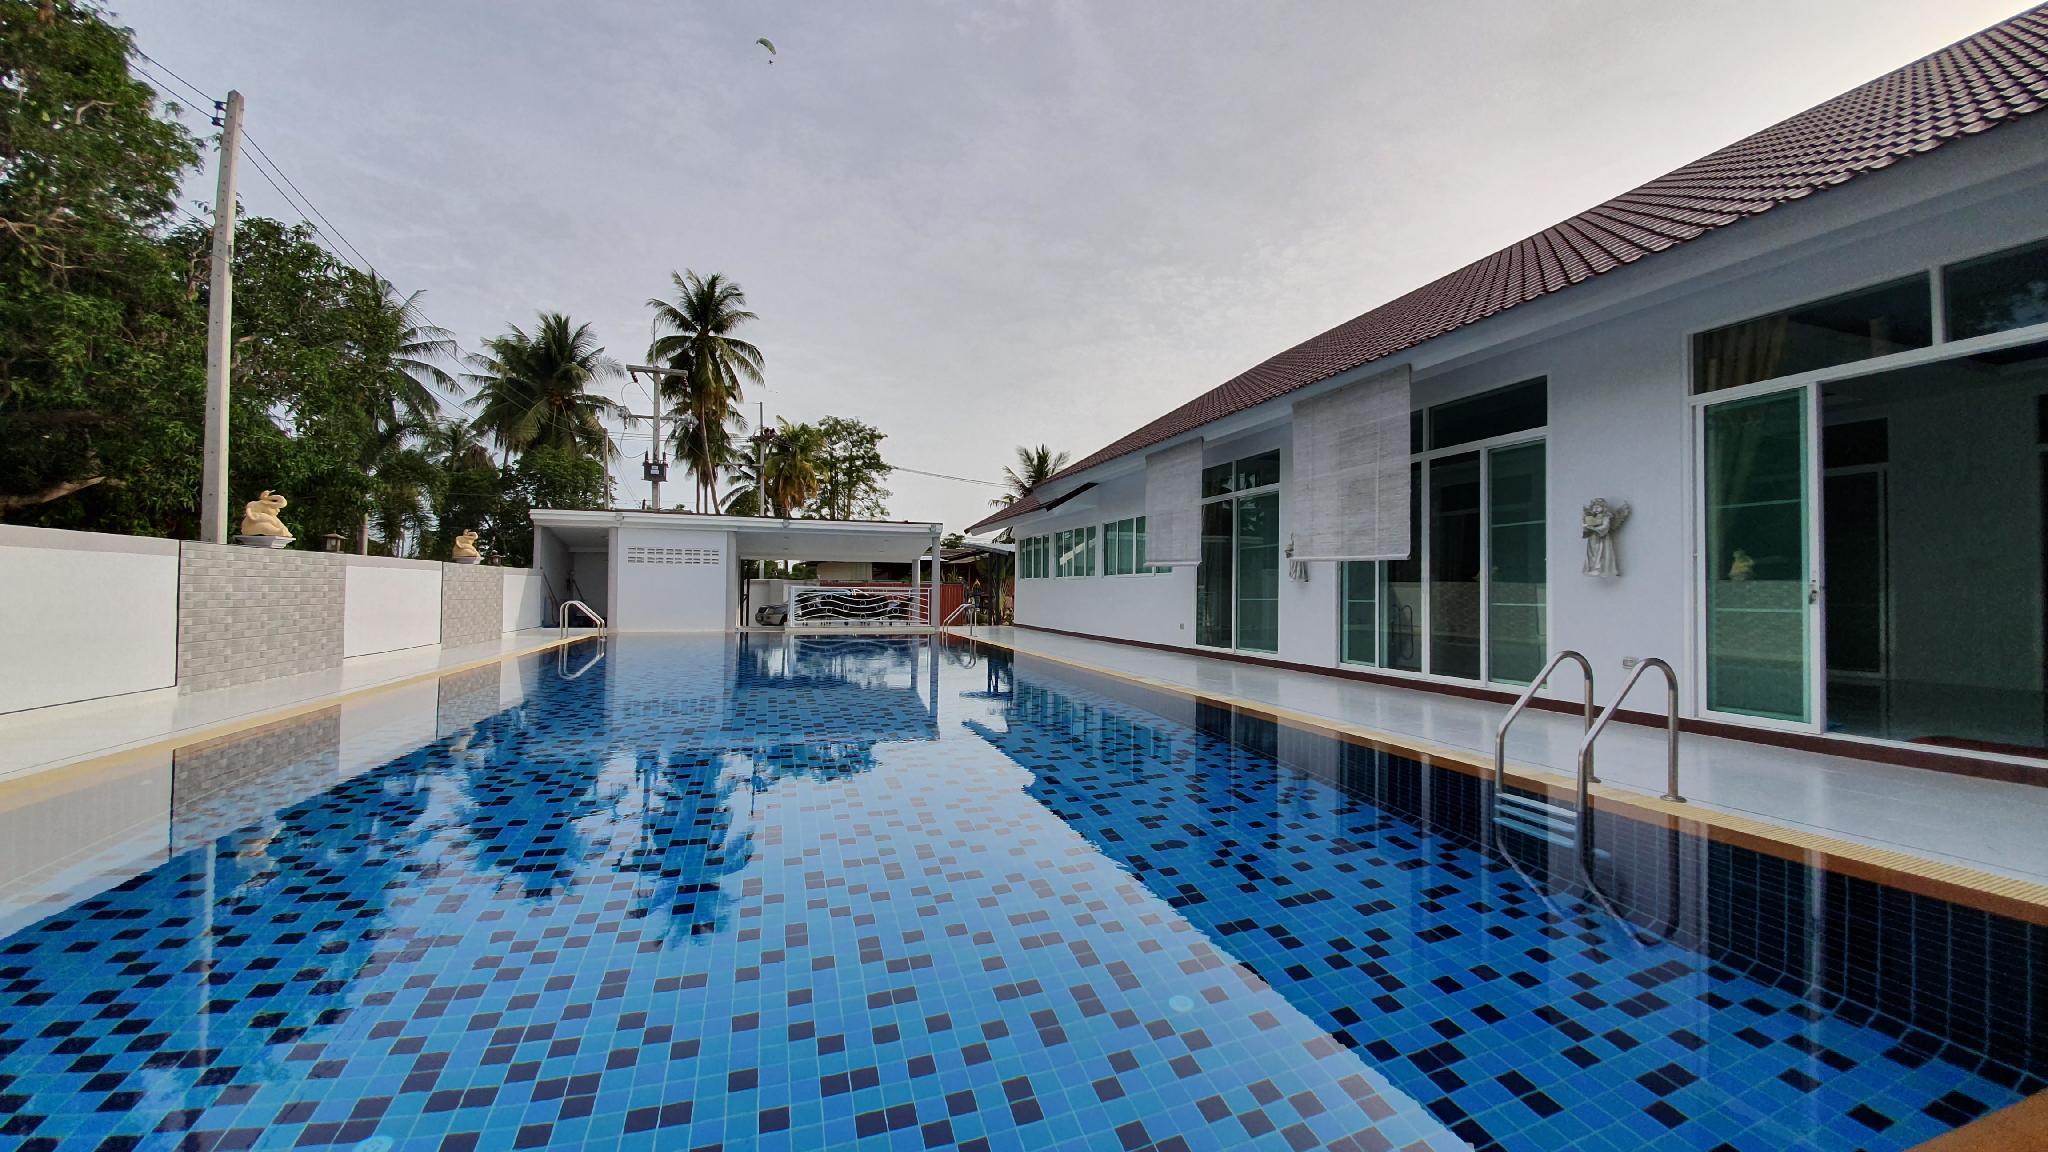 White Angel Pool Villa วิลลา 5 ห้องนอน 5 ห้องน้ำส่วนตัว ขนาด 1600 ตร.ม. – หนองปลาไหล